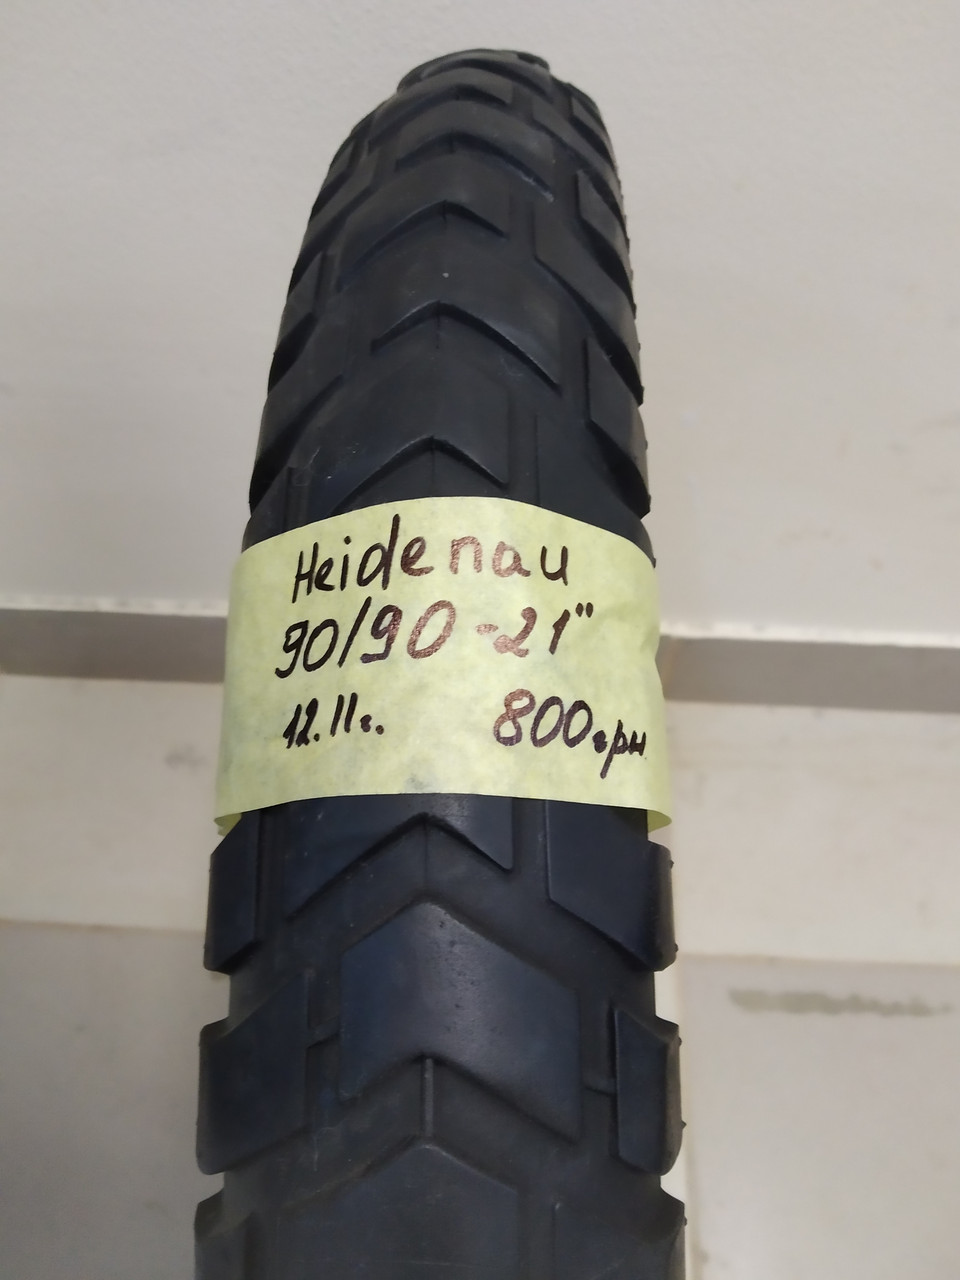 Heidenau 90 90 21  (12.11) мото шина покрышка резина колесо